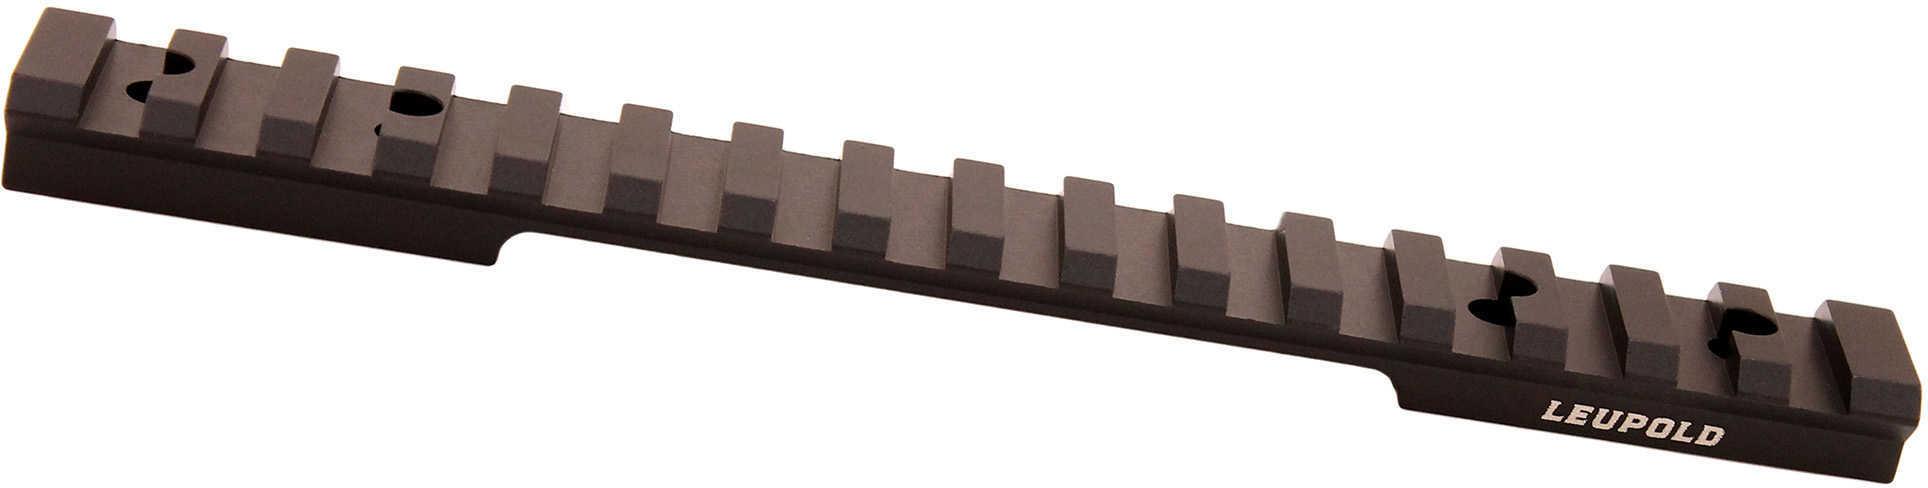 Leupold BackCountry Cross-Slot 1 Piece Base Weatherby Mark 5/Vanguard, Long Action, 20 MOA, Matte Black Md: 171355